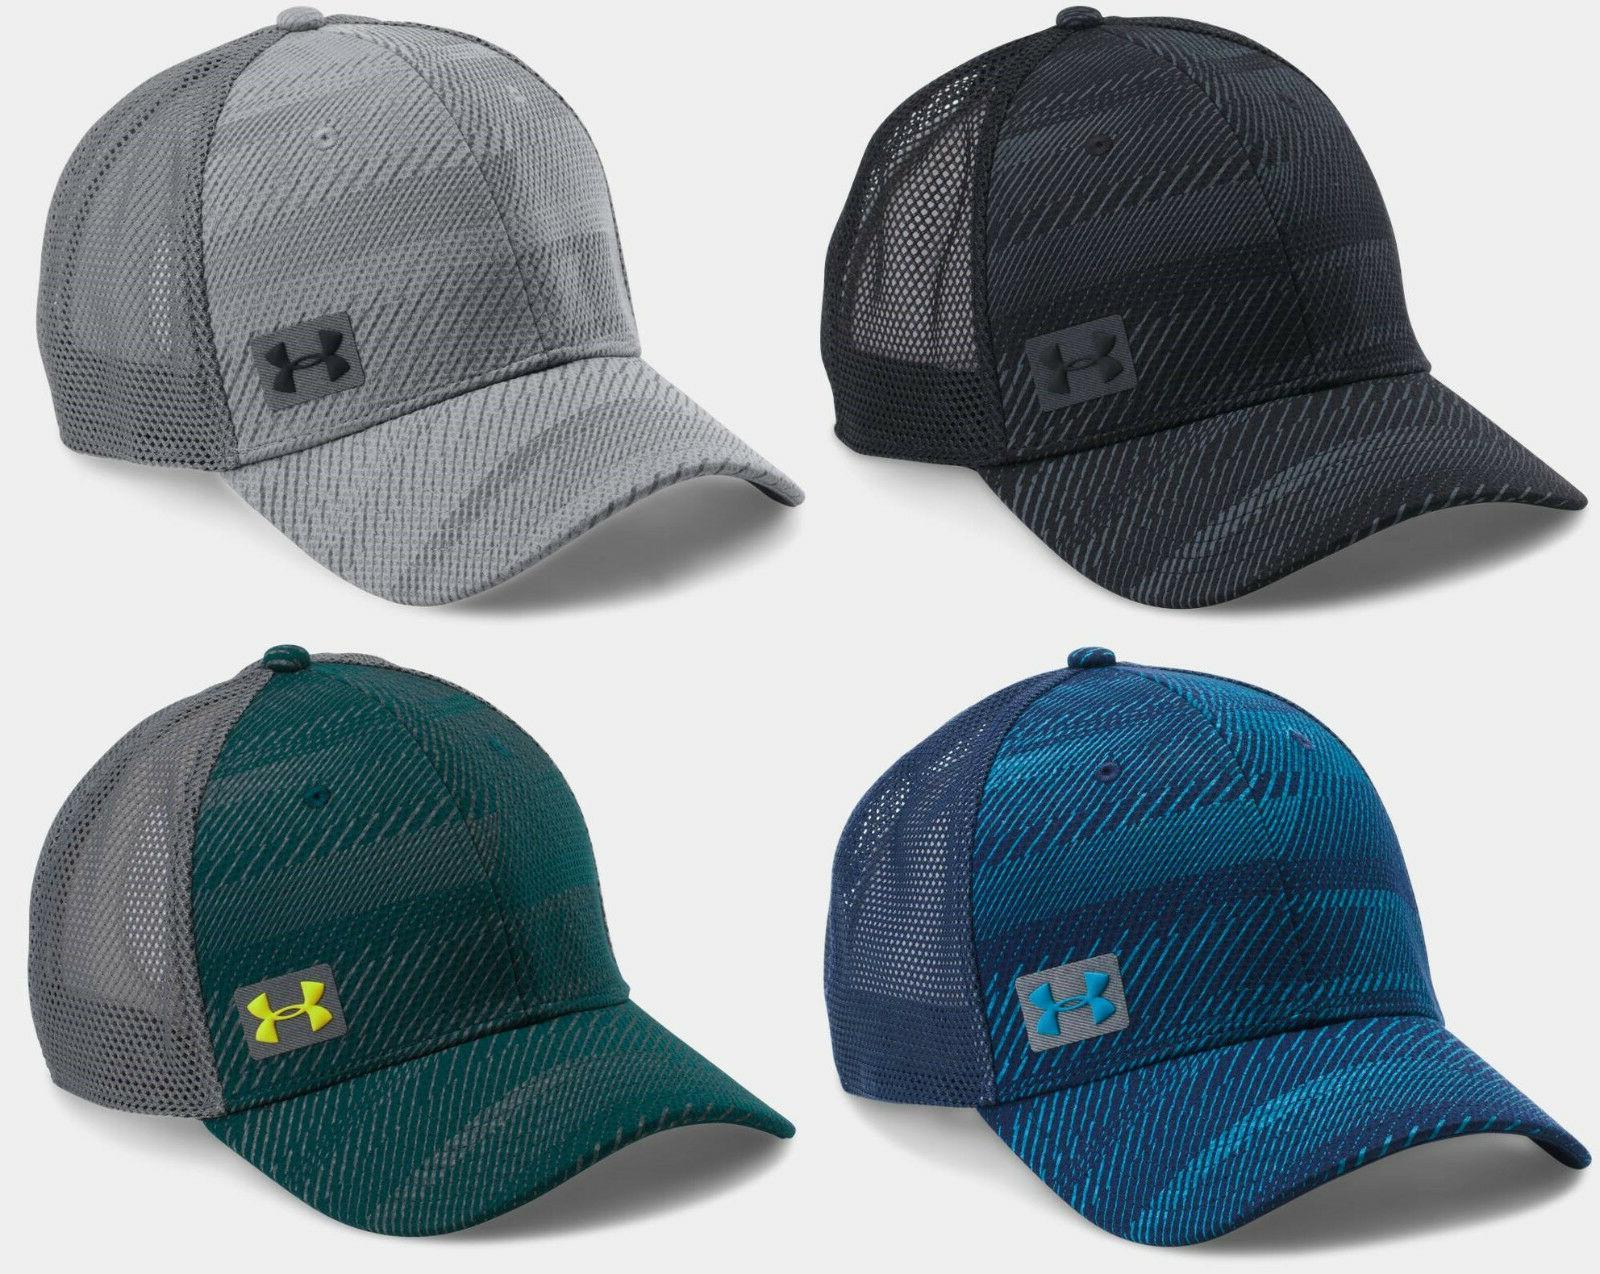 Under Armour Men's UA Blitz Trucker Mesh Back Hat Snapback C